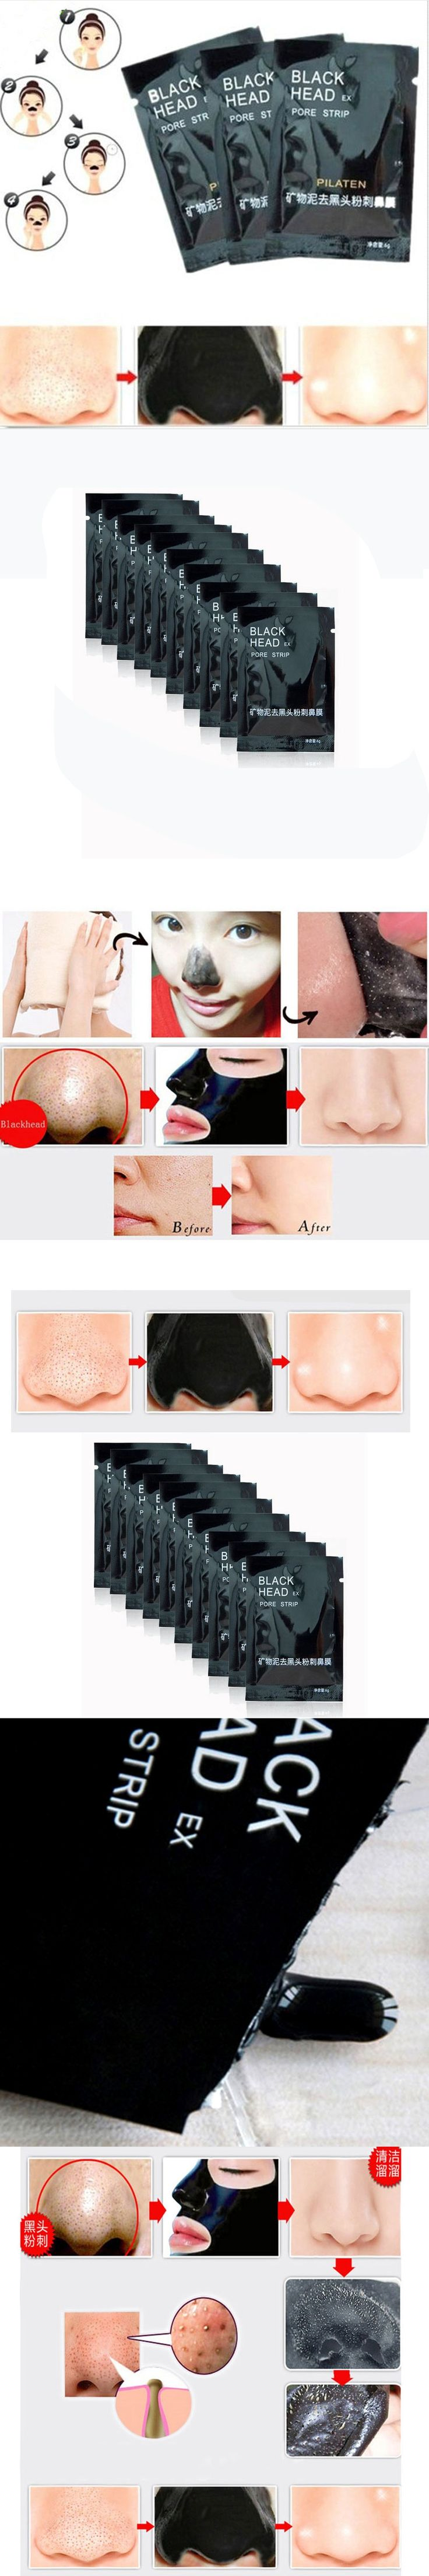 5pcs Blackhead Face Mask Remover Nose Black Mask  Mud 6g Deep Cleansing Acne Treatment Black Head Pilaten